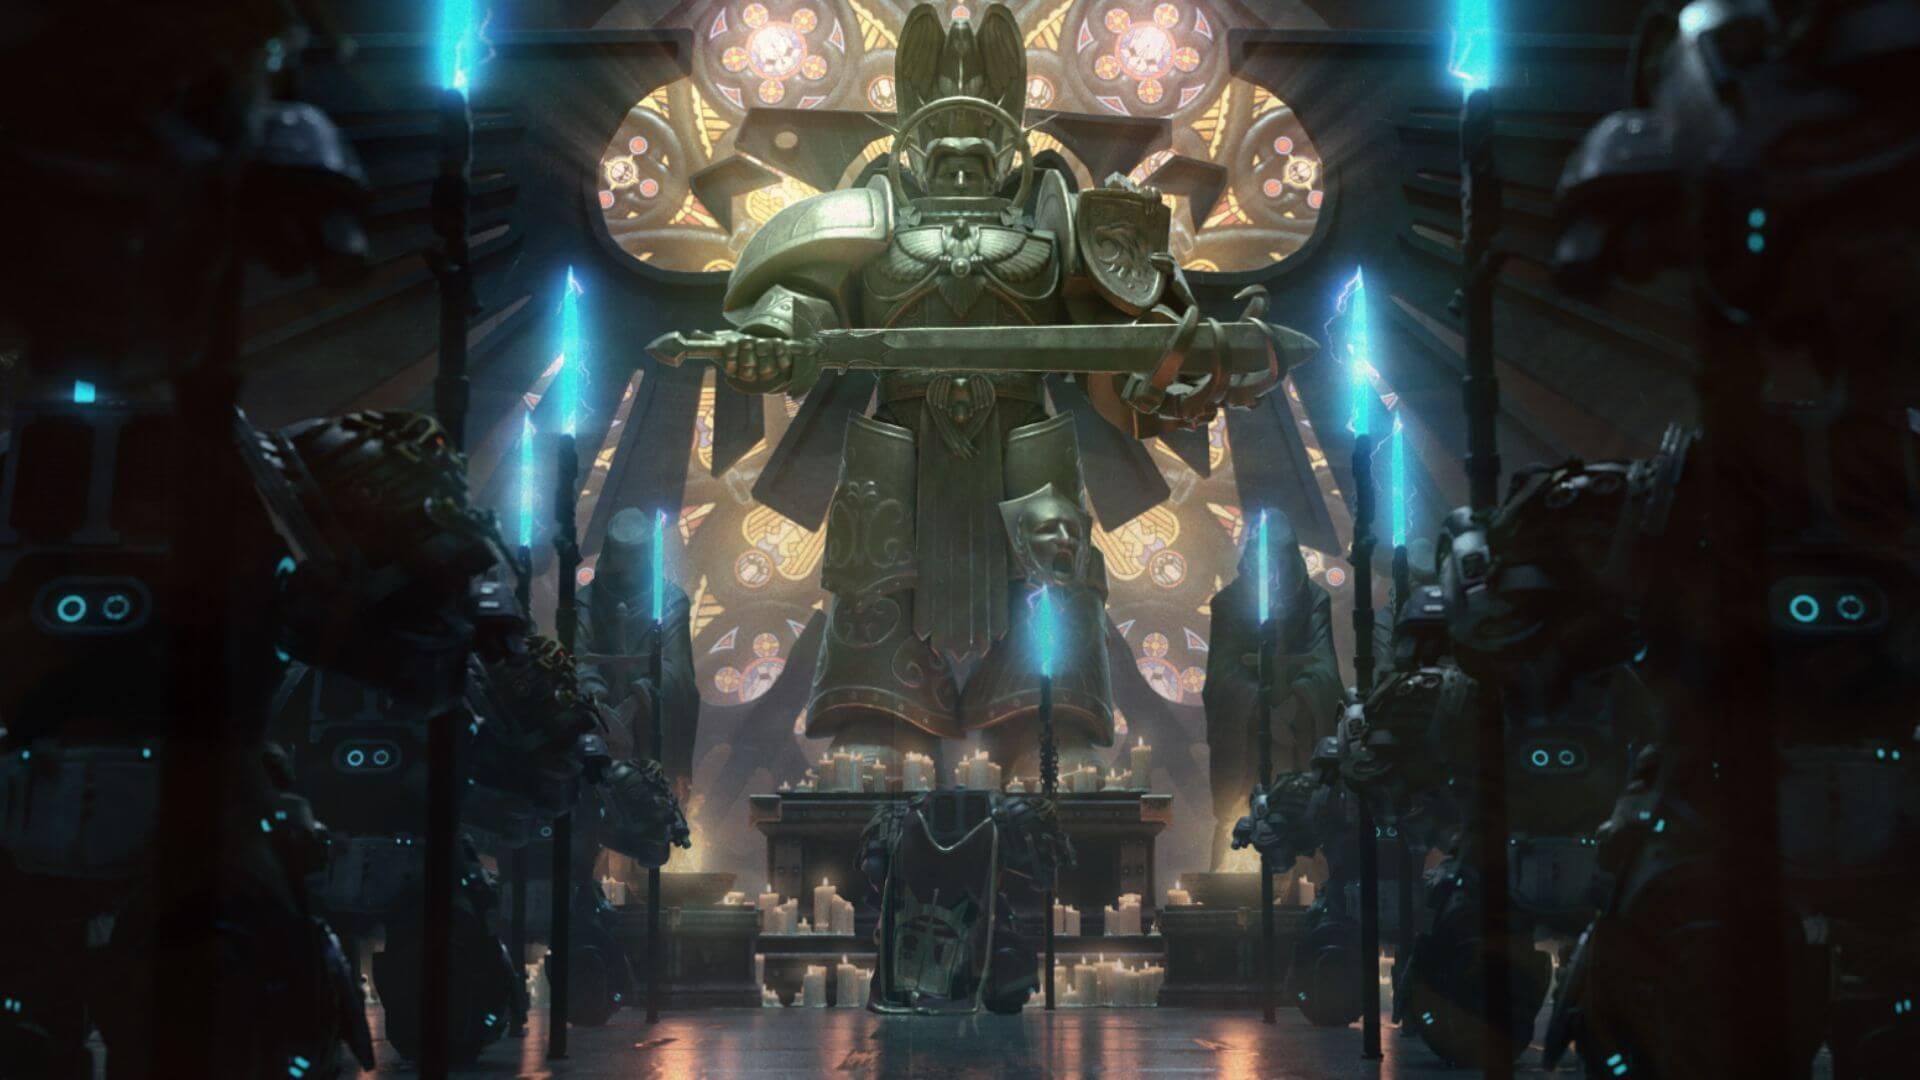 Warhammer 40K chaos gate daemonhunters screenshot